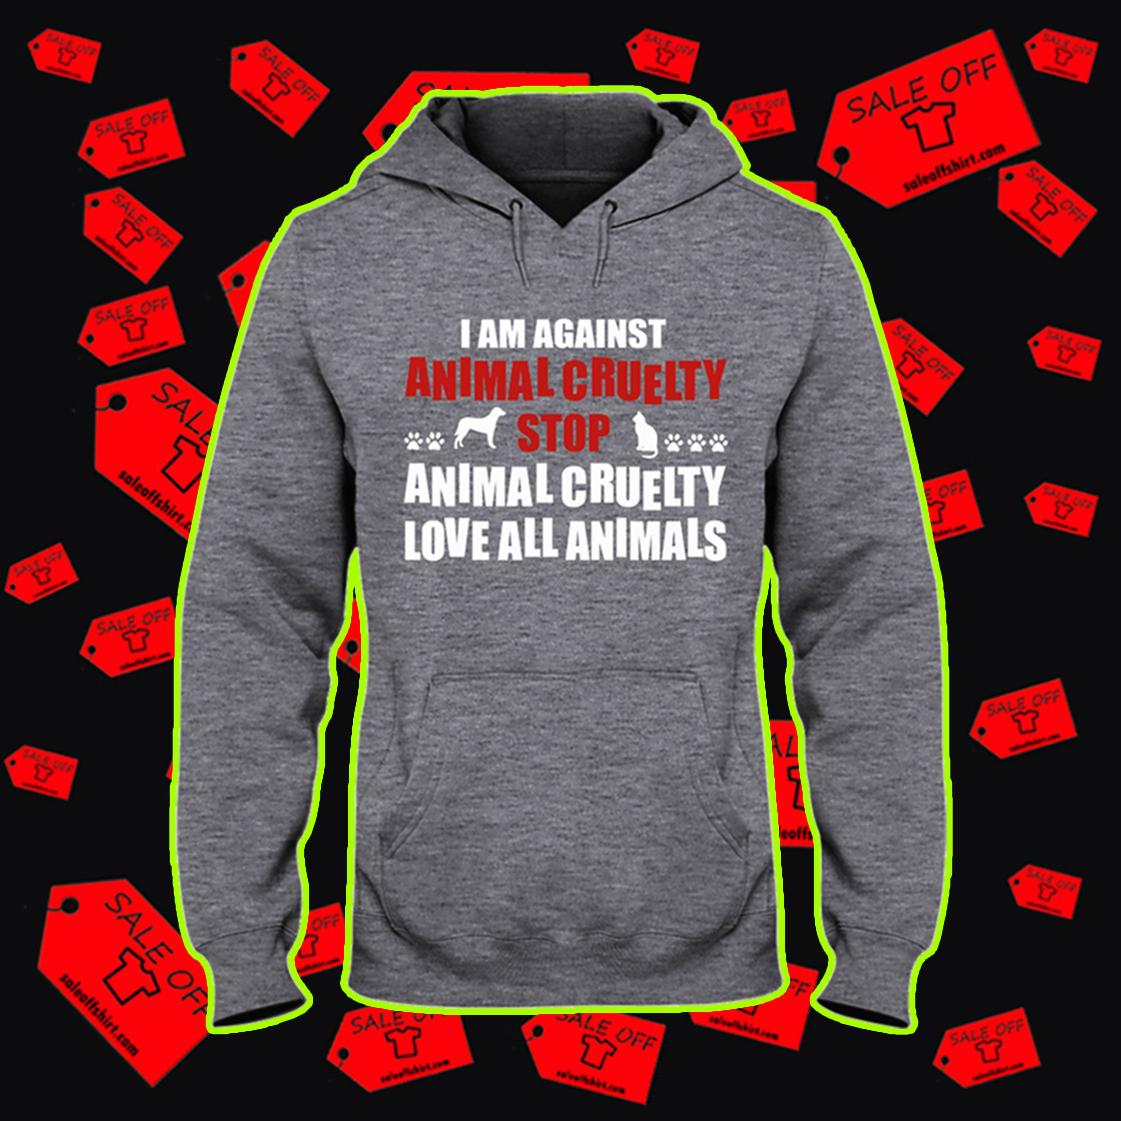 I am against animal cruelty stop animal cruelty love all animals hooded sweatshirt